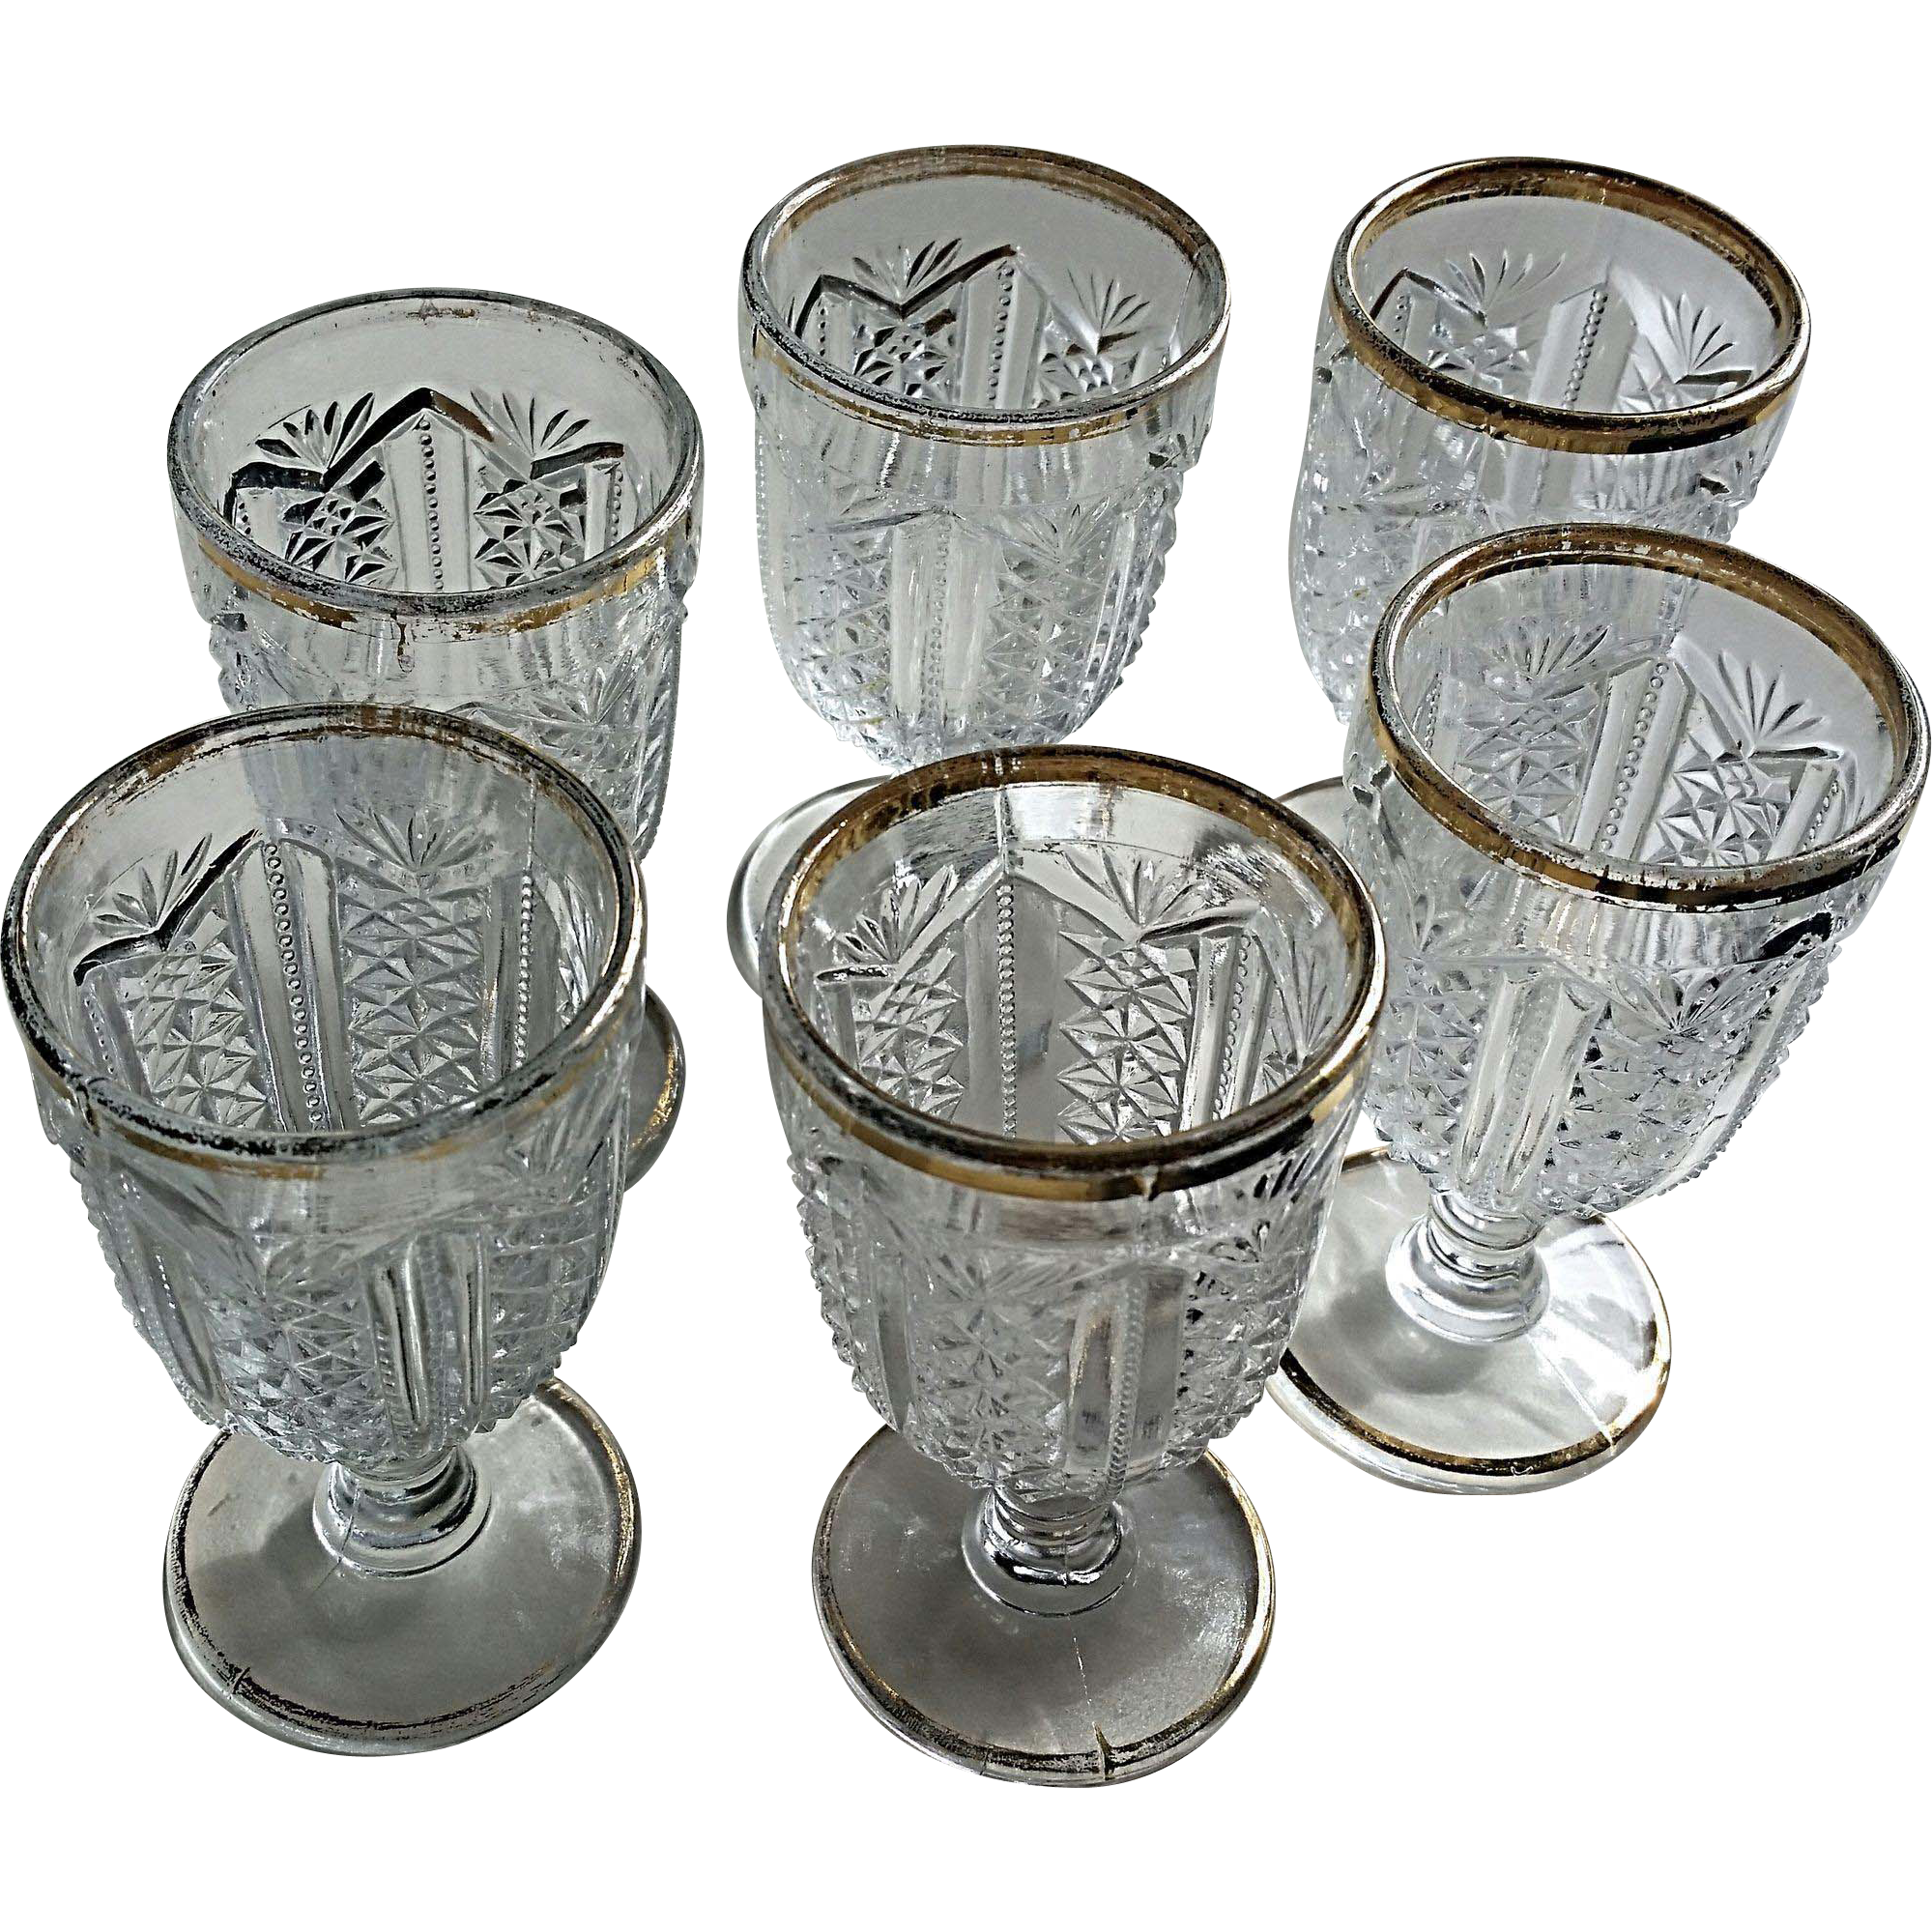 Pattern glass wine stems / goblets, set of 6, Eapg